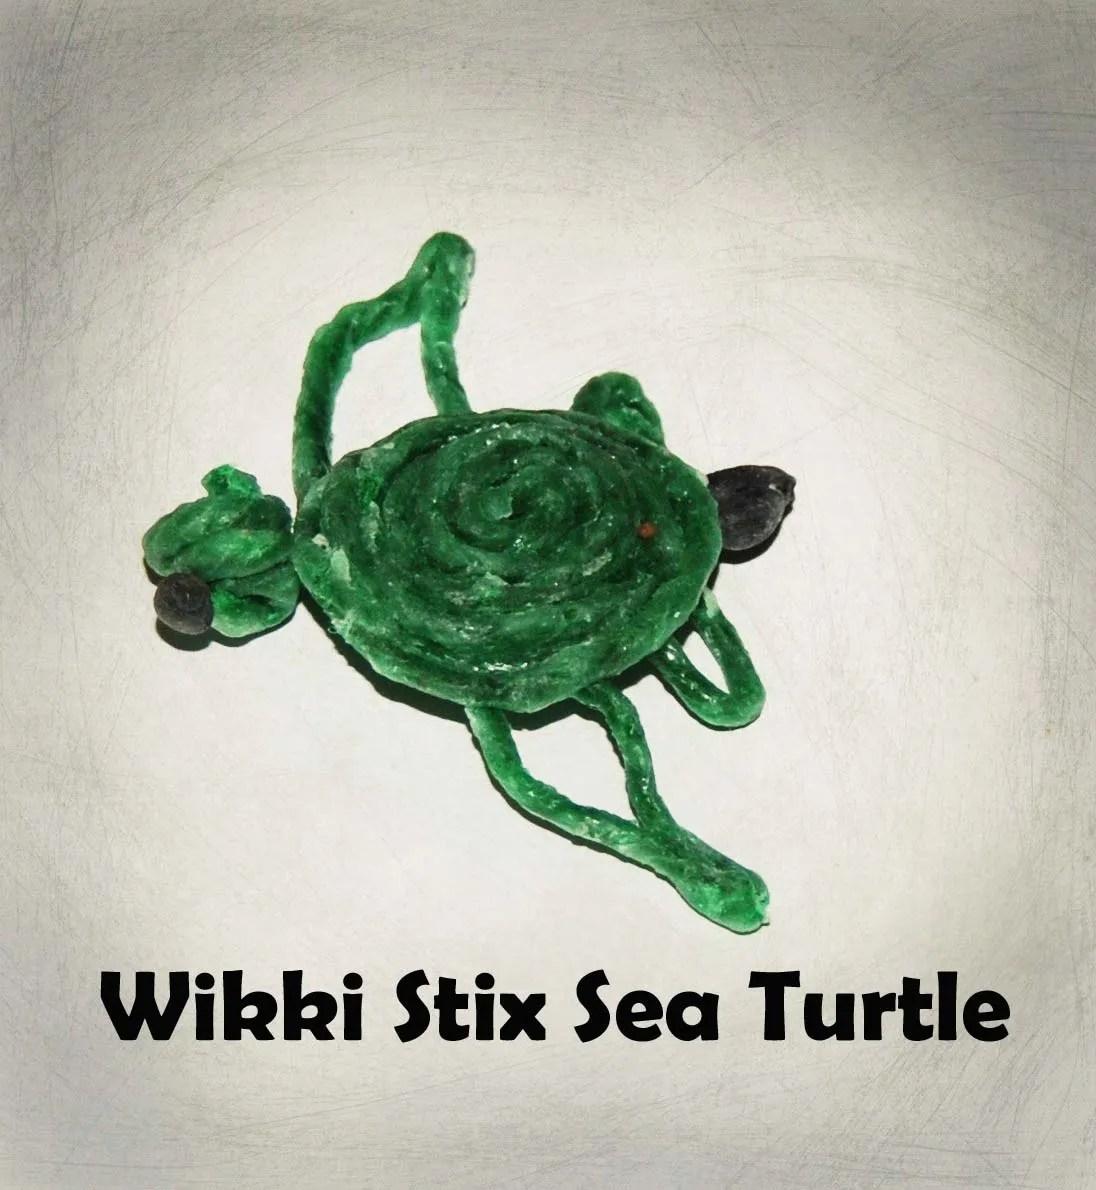 Wikki Stix Sea Turtle Life Cycle For Kids